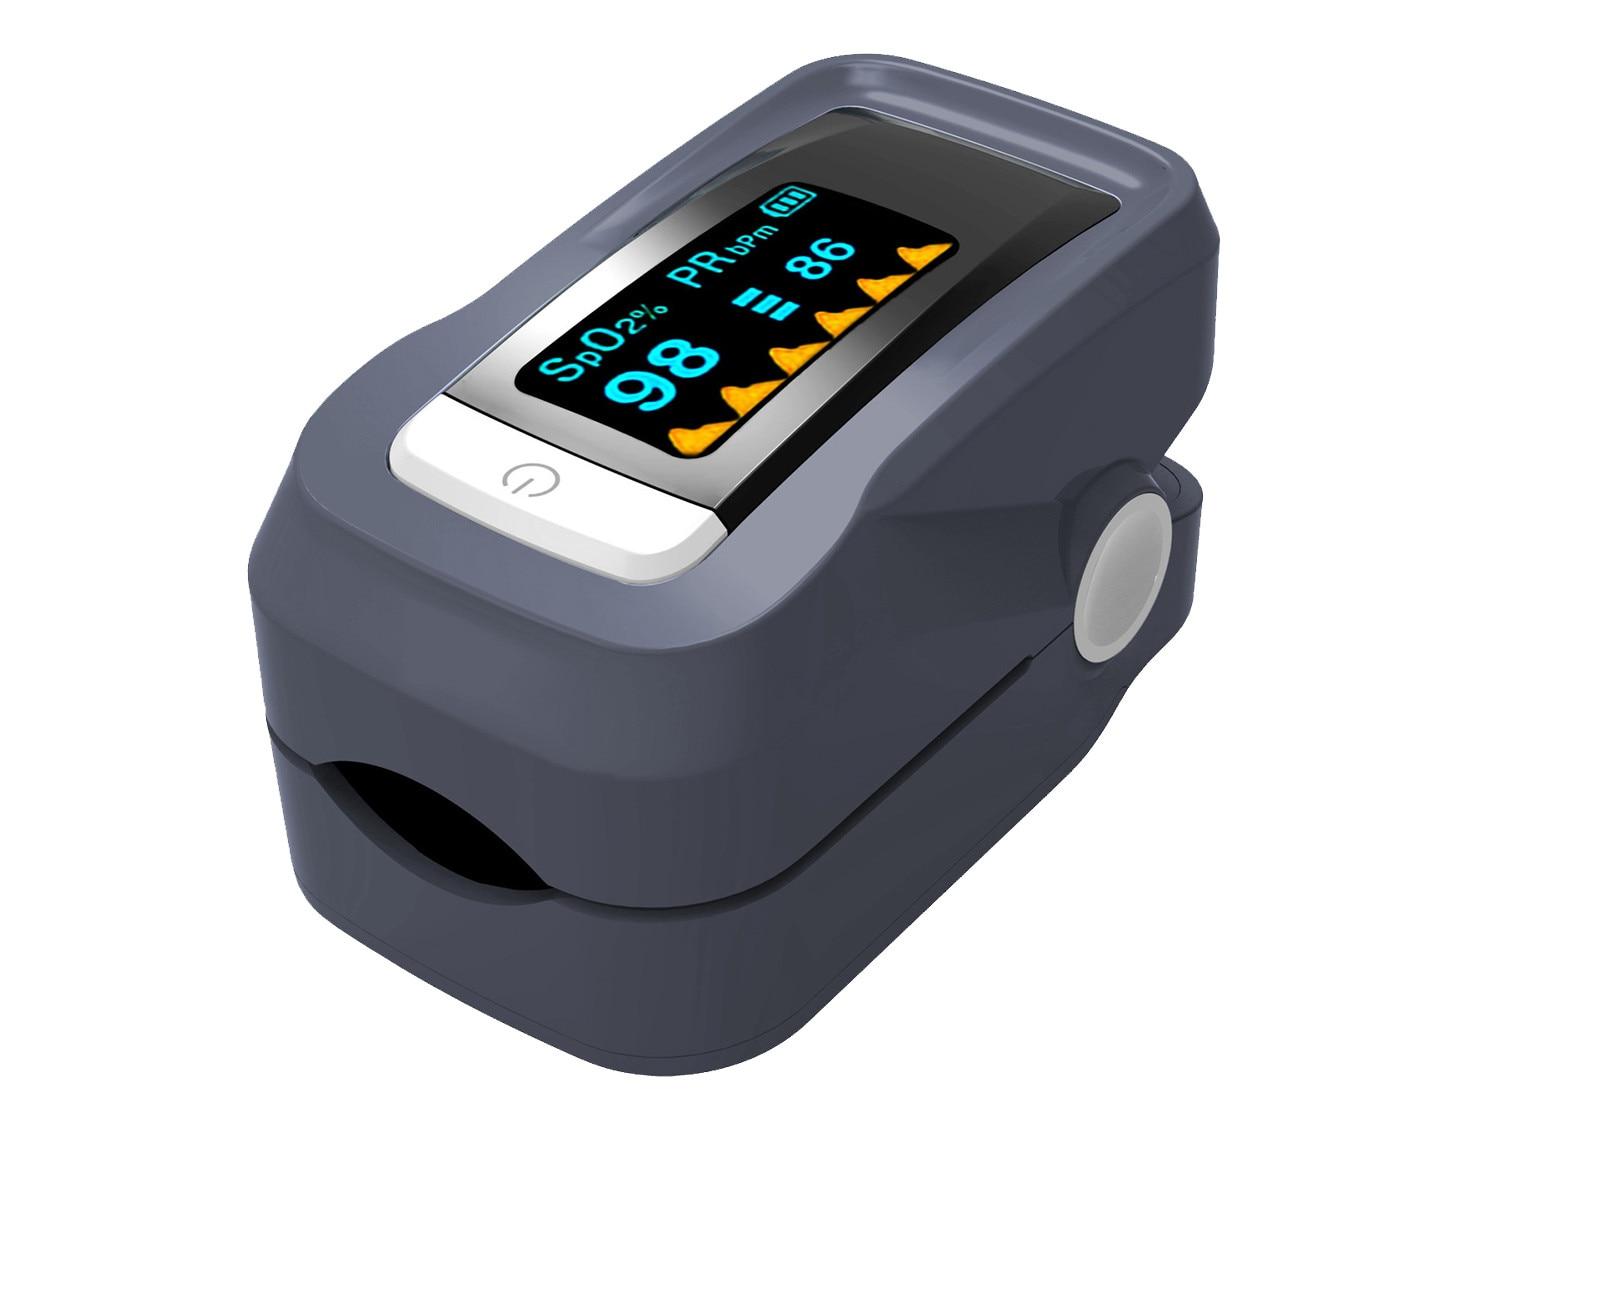 Finger Clip Oximeter Heart Rate Monitoring Blood Oxygen Saturation Monitor Oxygen Meter Sensor Pressure Health Care Fitness